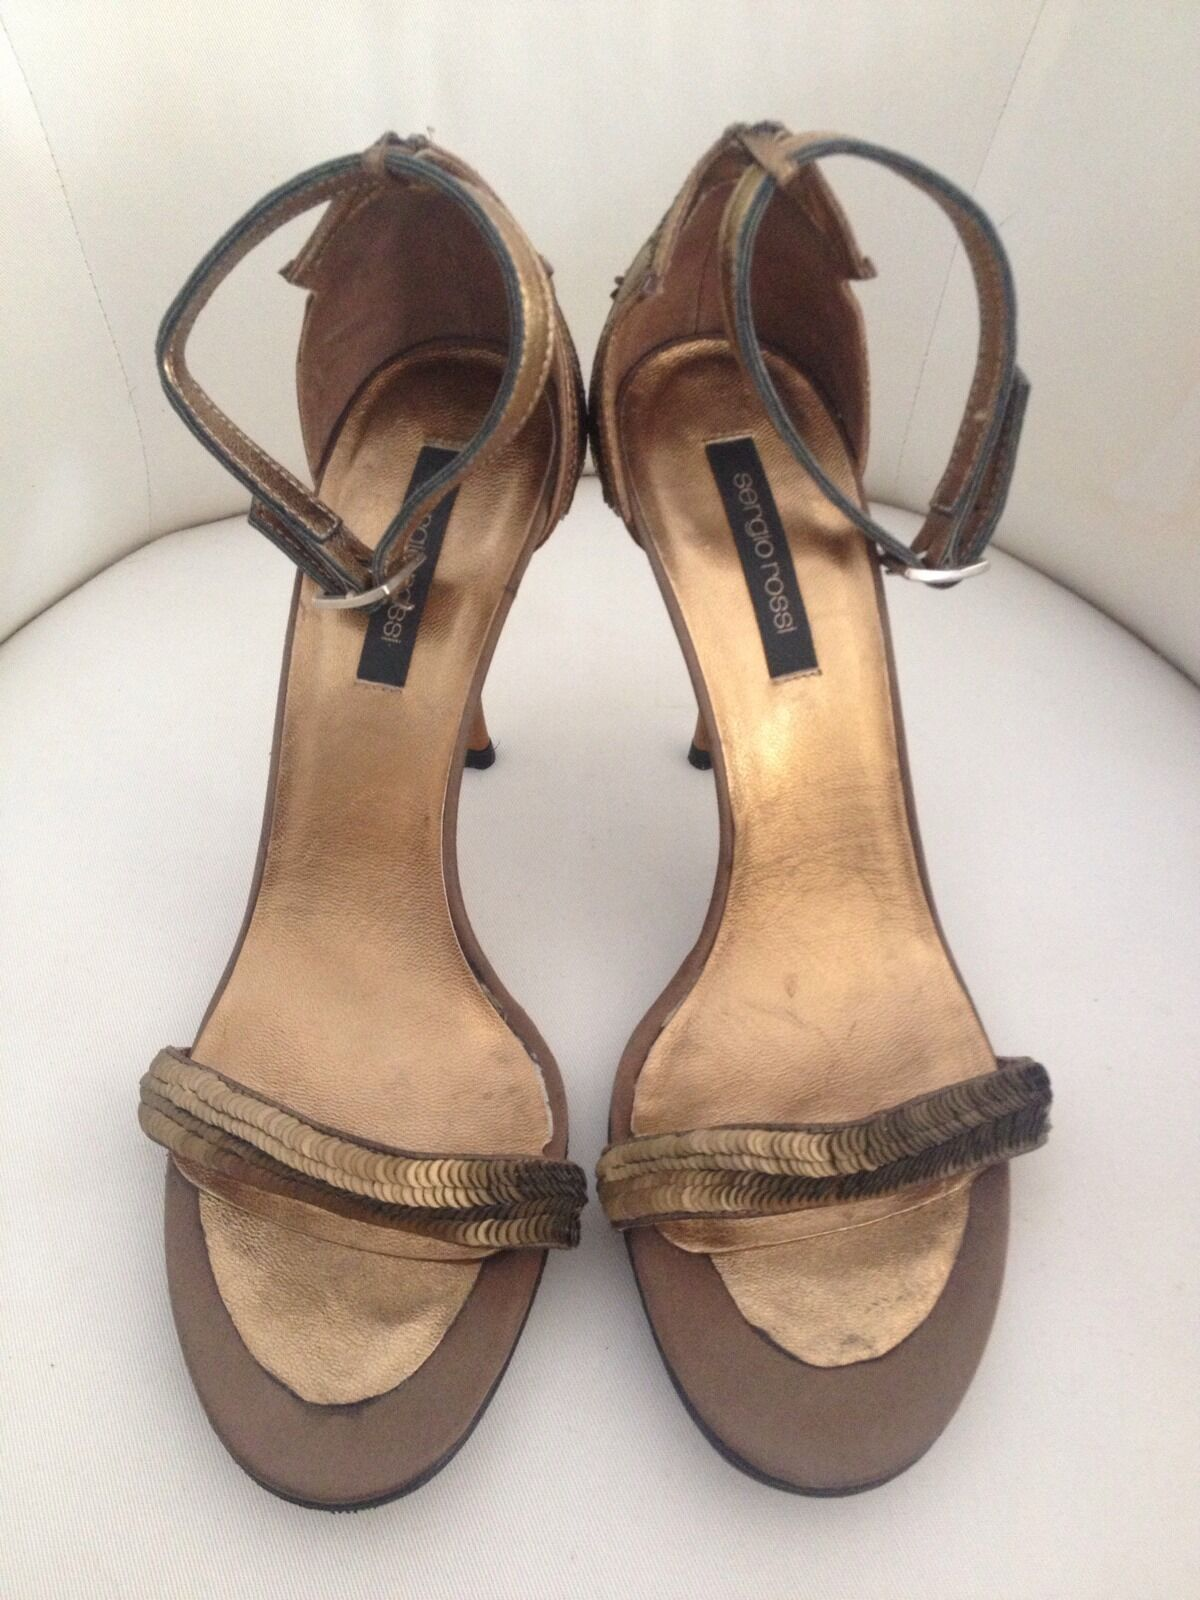 SERGIO ROSSI Bronze Sequin Ankle Strap High Heel Sandals